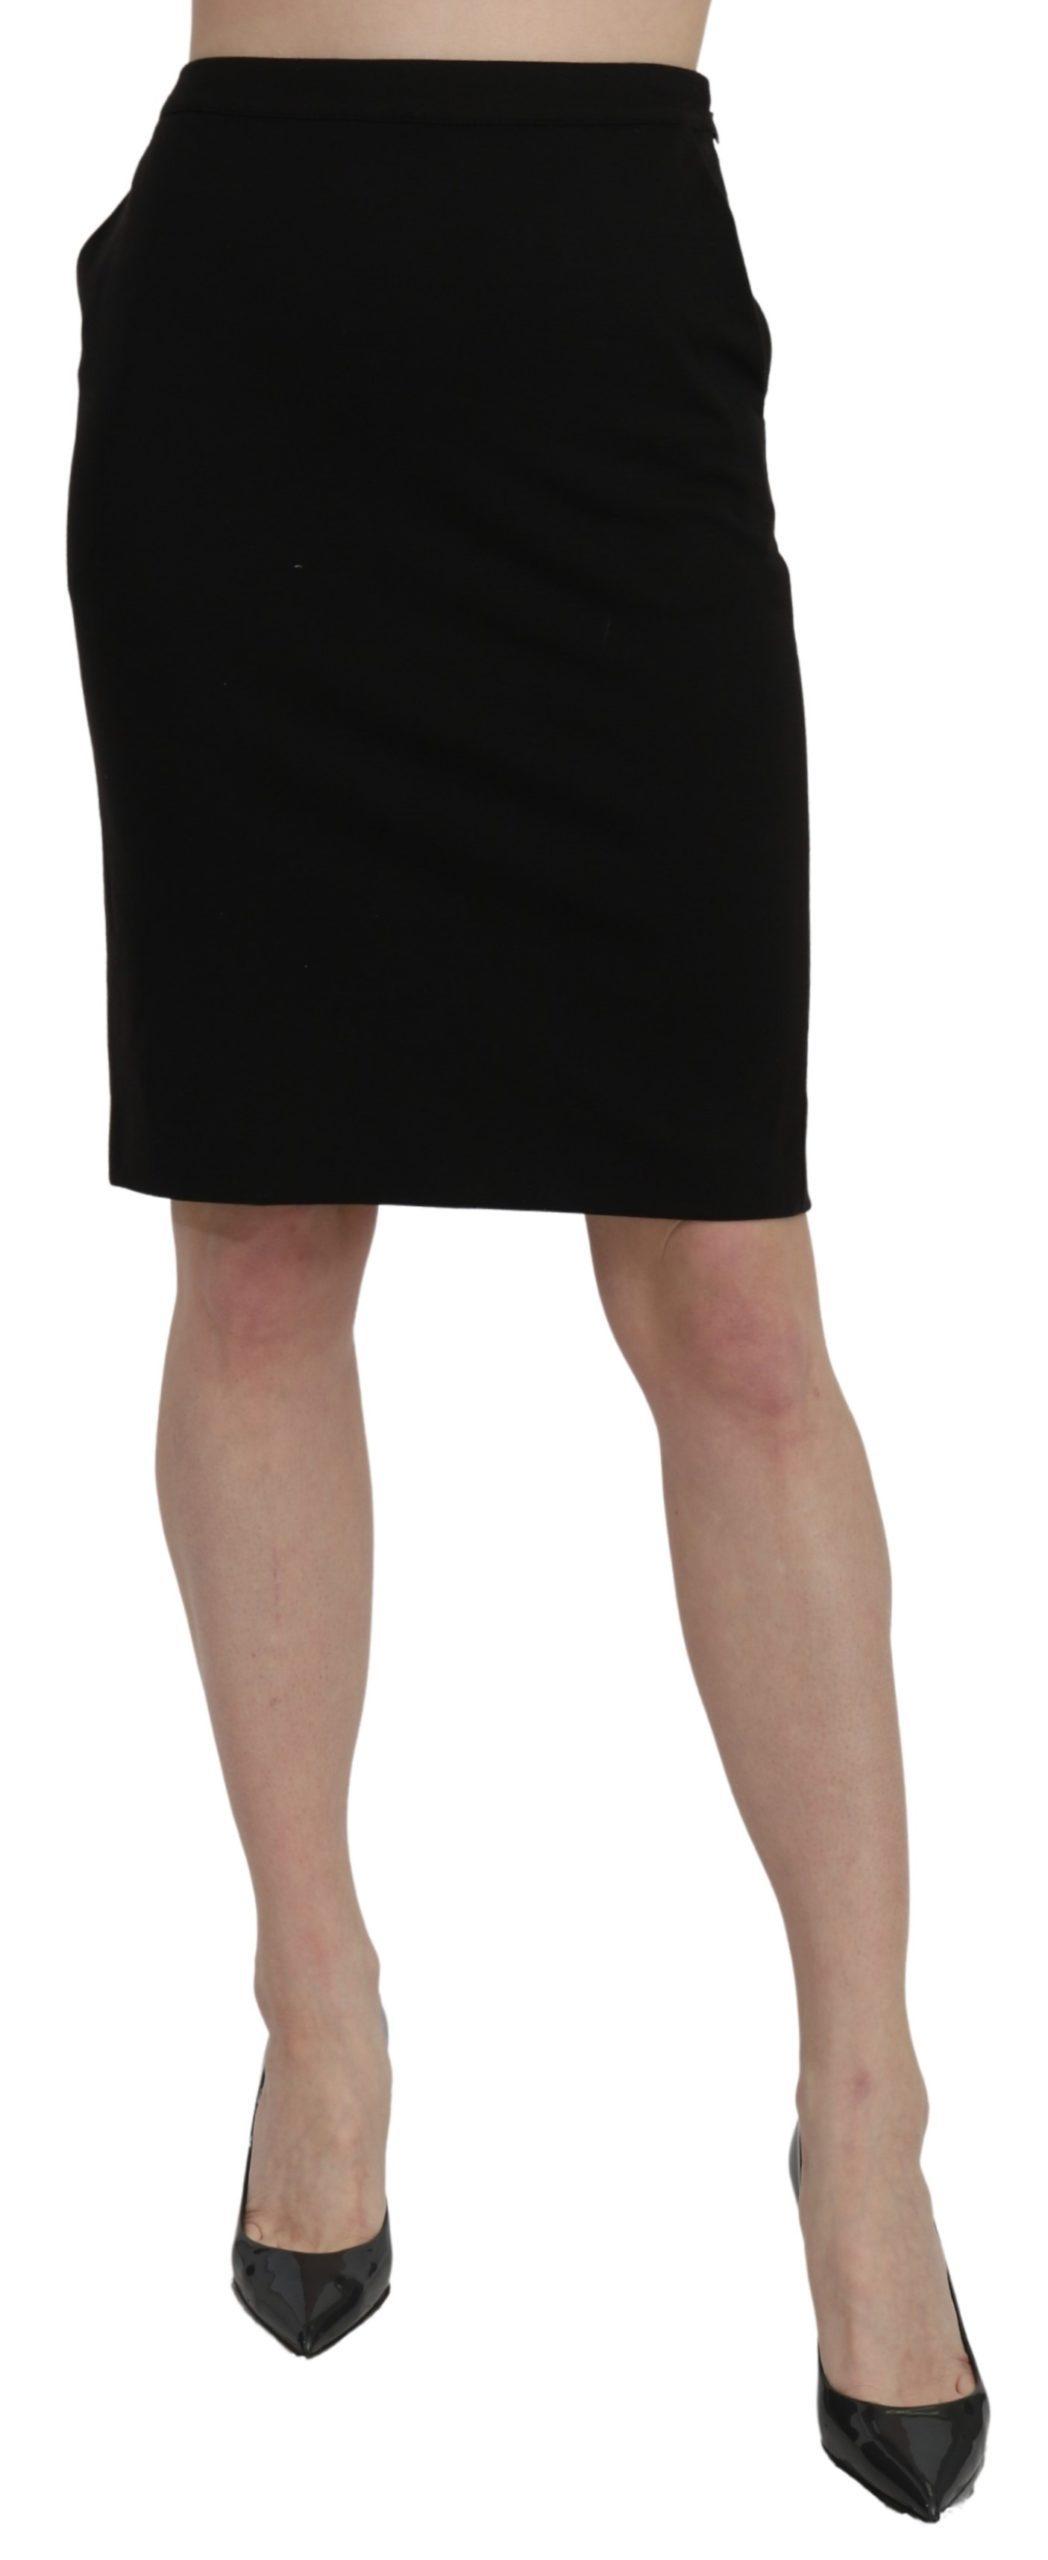 GF Ferre Women's High Waist Pencil Cut Formal Skirt Black SKI1398 - IT40|S